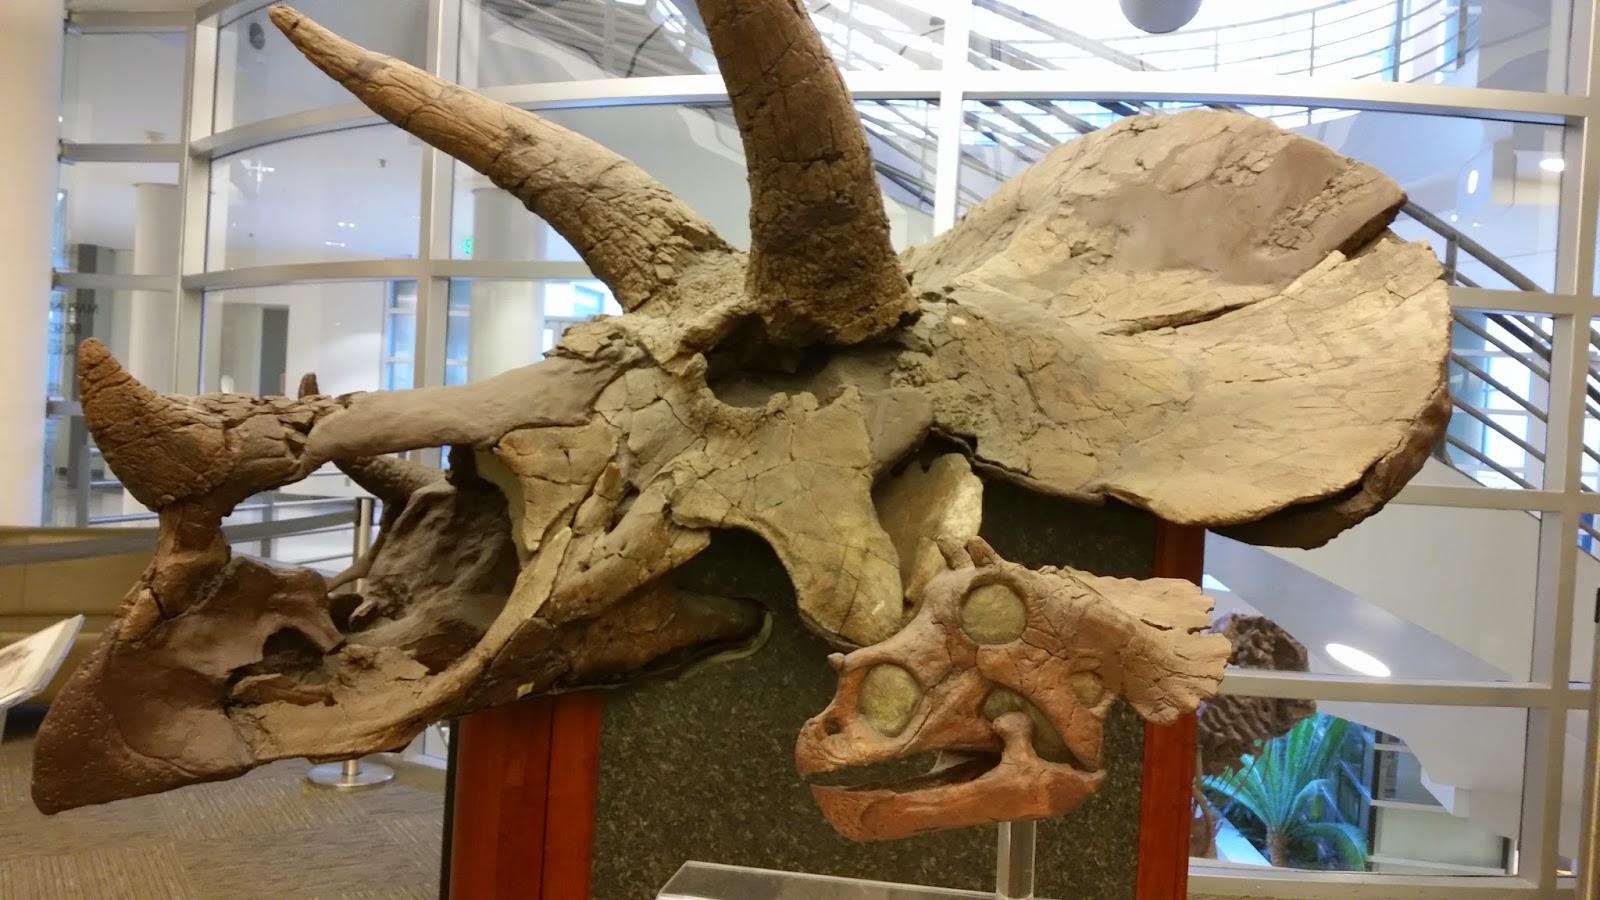 Dino Museums Archives - I Know Dino: The Big Dinosaur Podcast